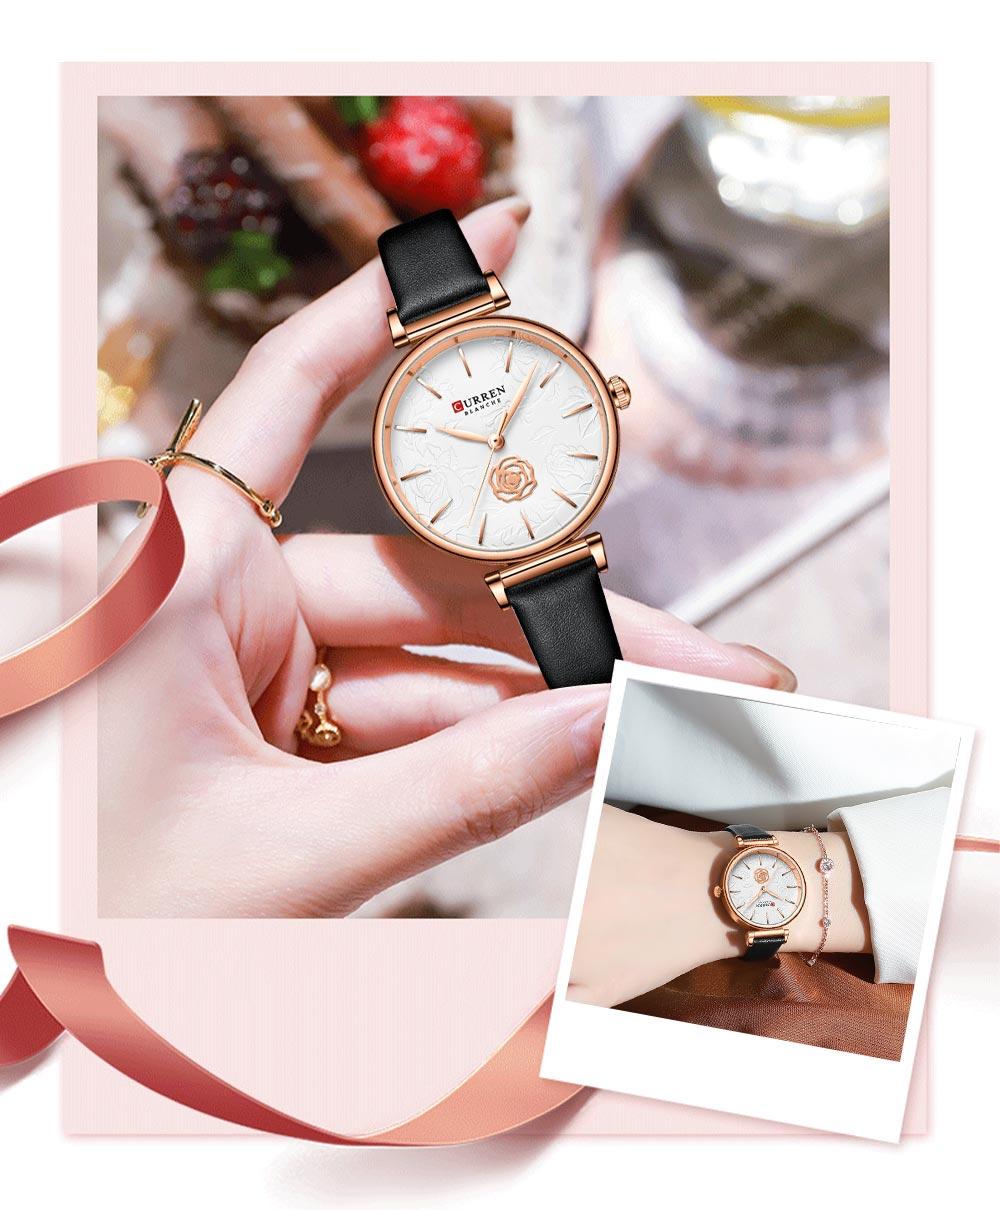 watch women 2020 latest rounded CURREN Women Watch Waterproof Top Brand Luxury Ladies Wristwatch Genuine Leather Classic girl enlarge